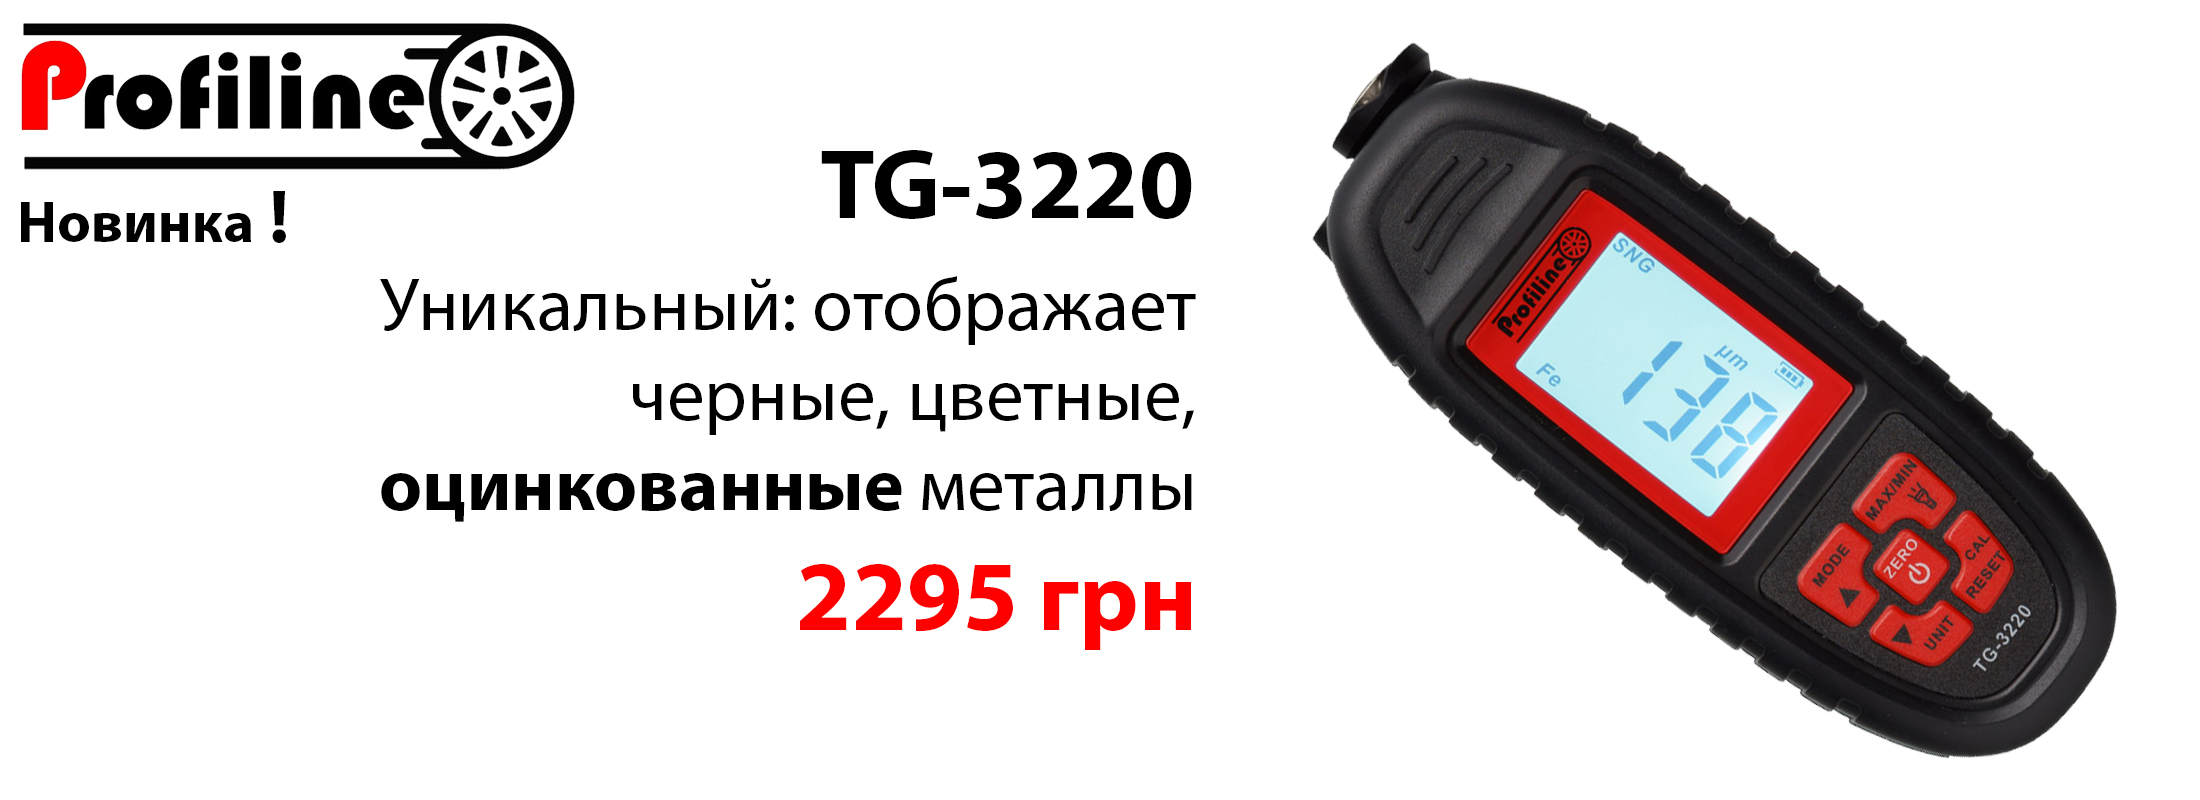 Profiline TG-3220